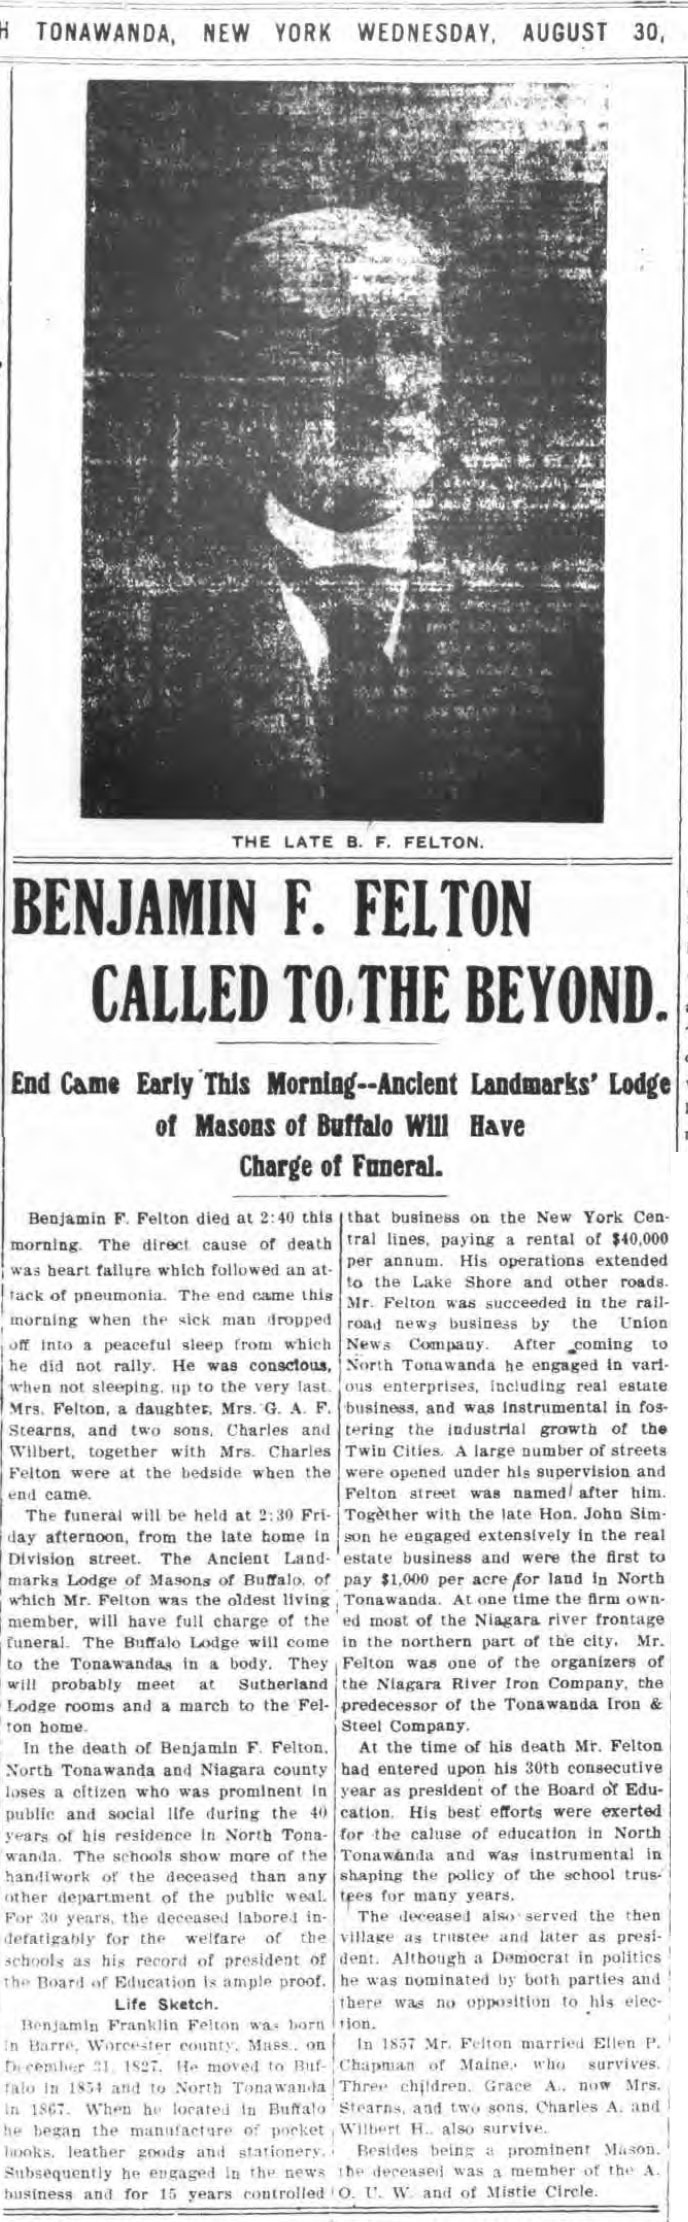 Benjamin F Felton Called to the Beyond, article (Tonawanda News, 1905-08-30).jpg